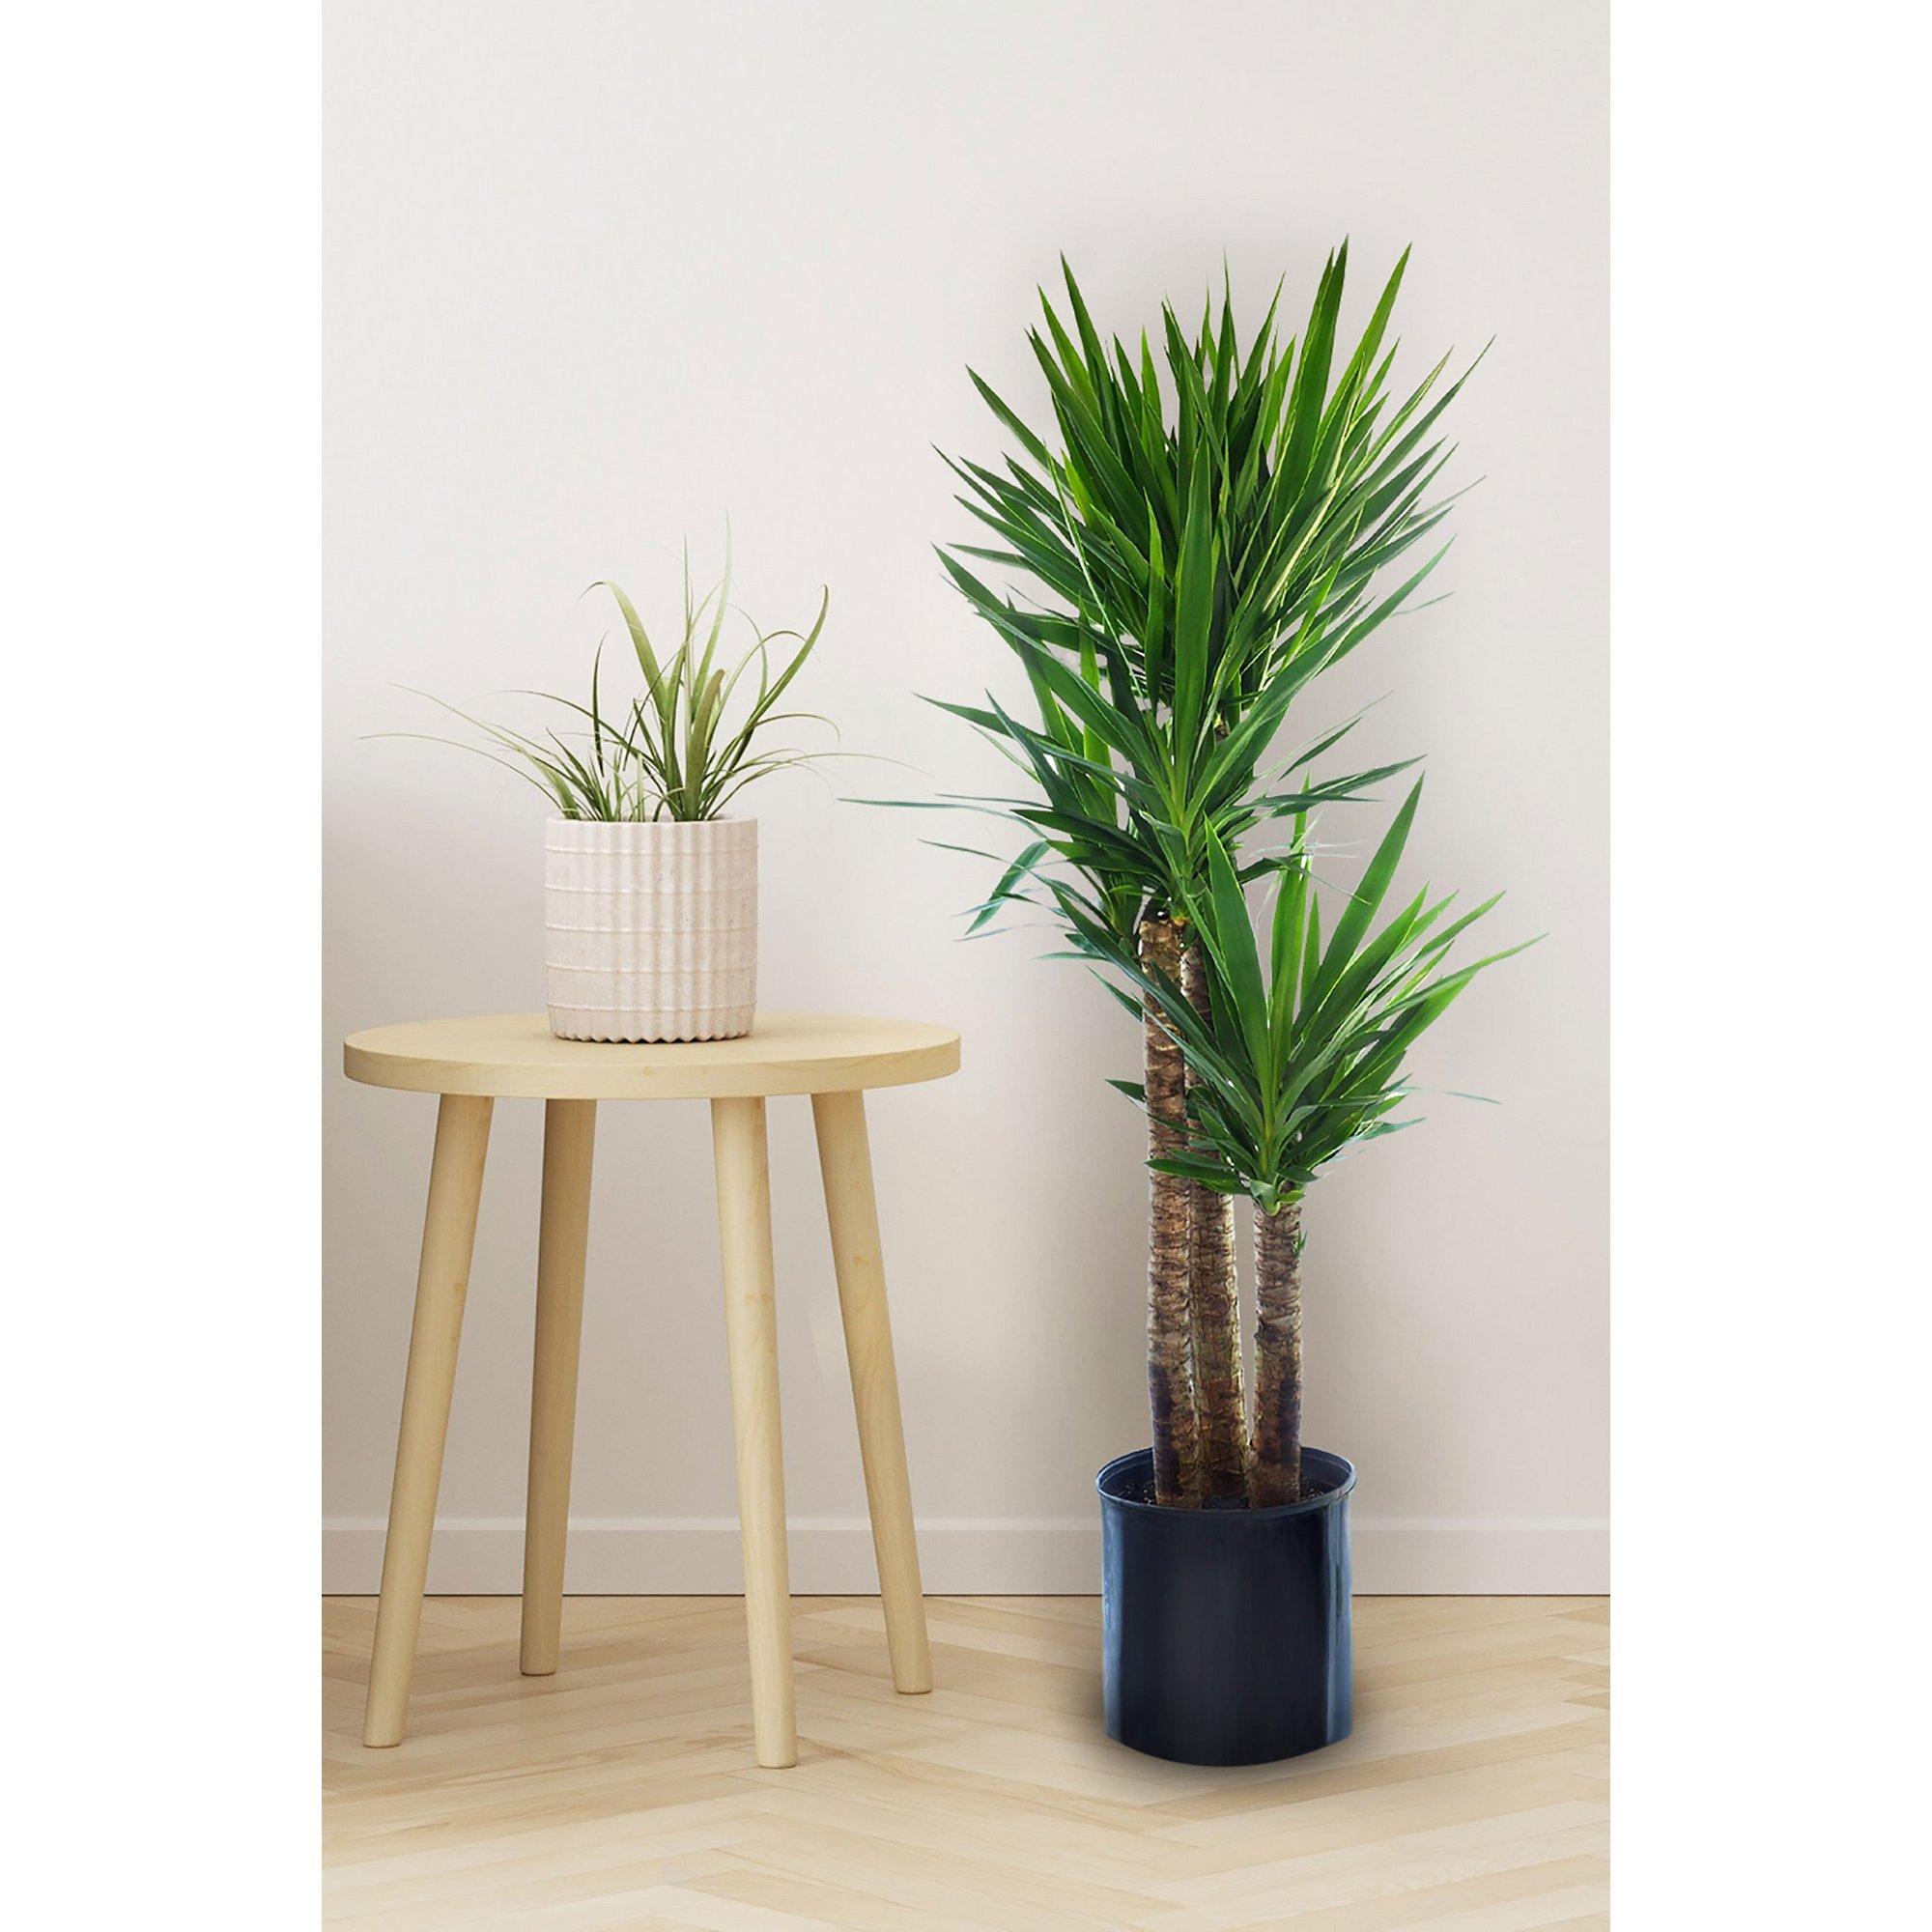 Image of 3 Stem Yucca in Pot